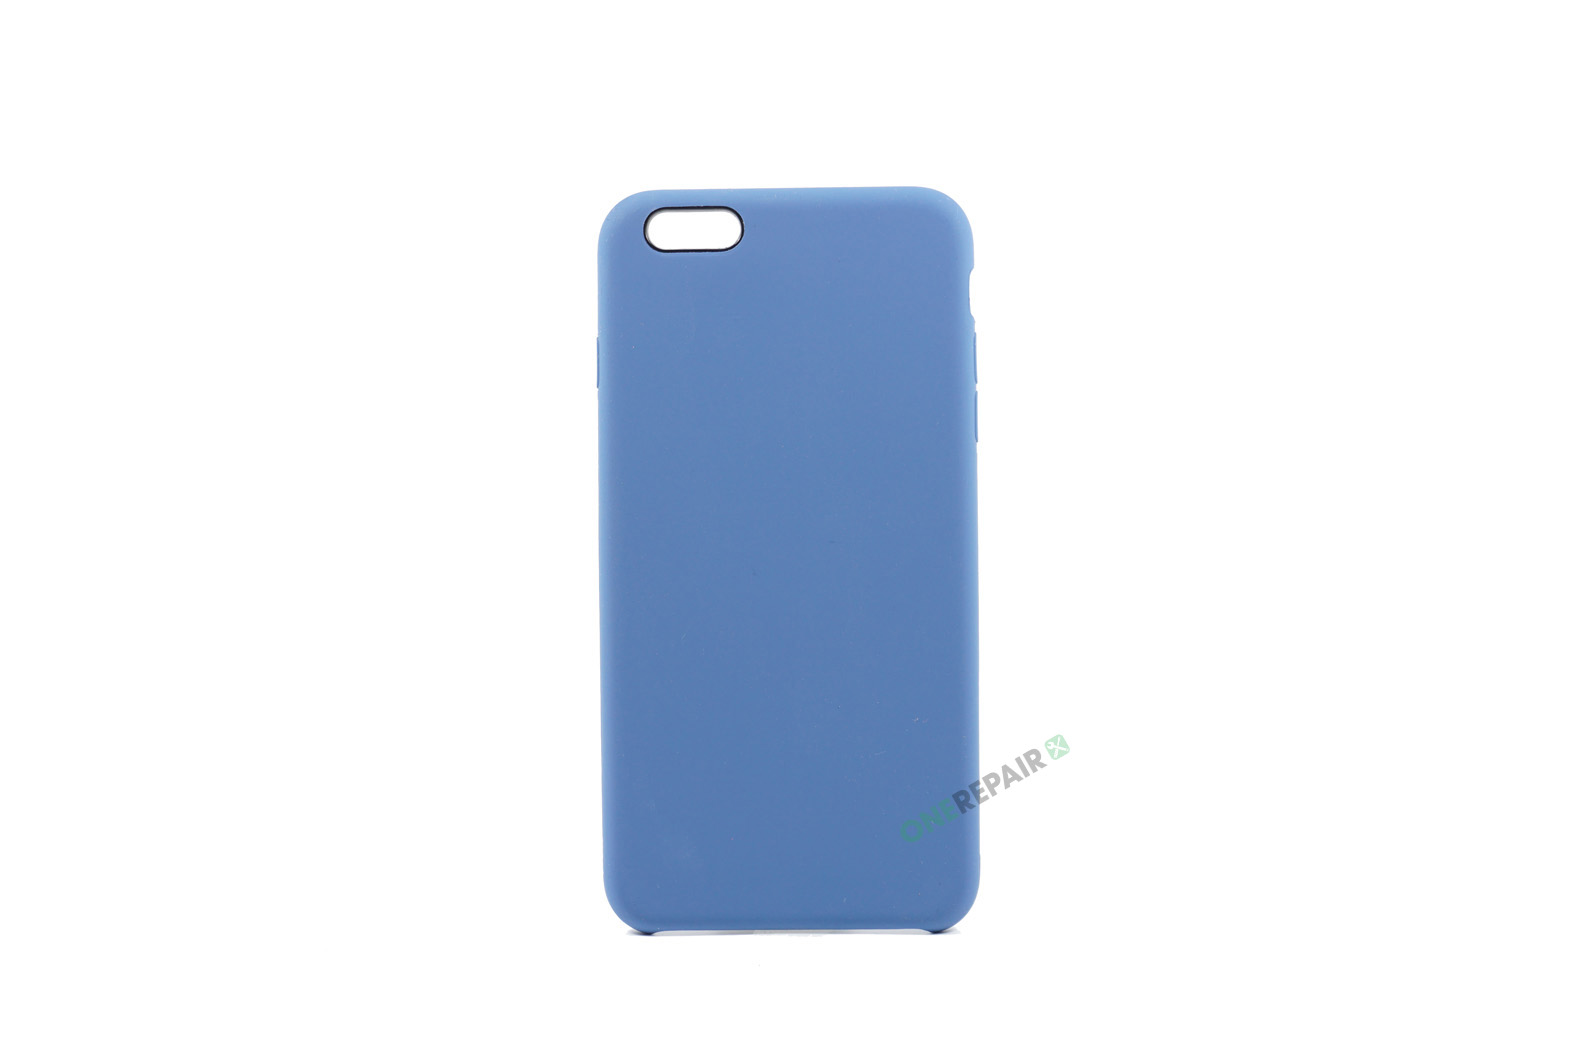 iPhone 6 Plus, iPhone 6S Plus, Silikone cover, Blå